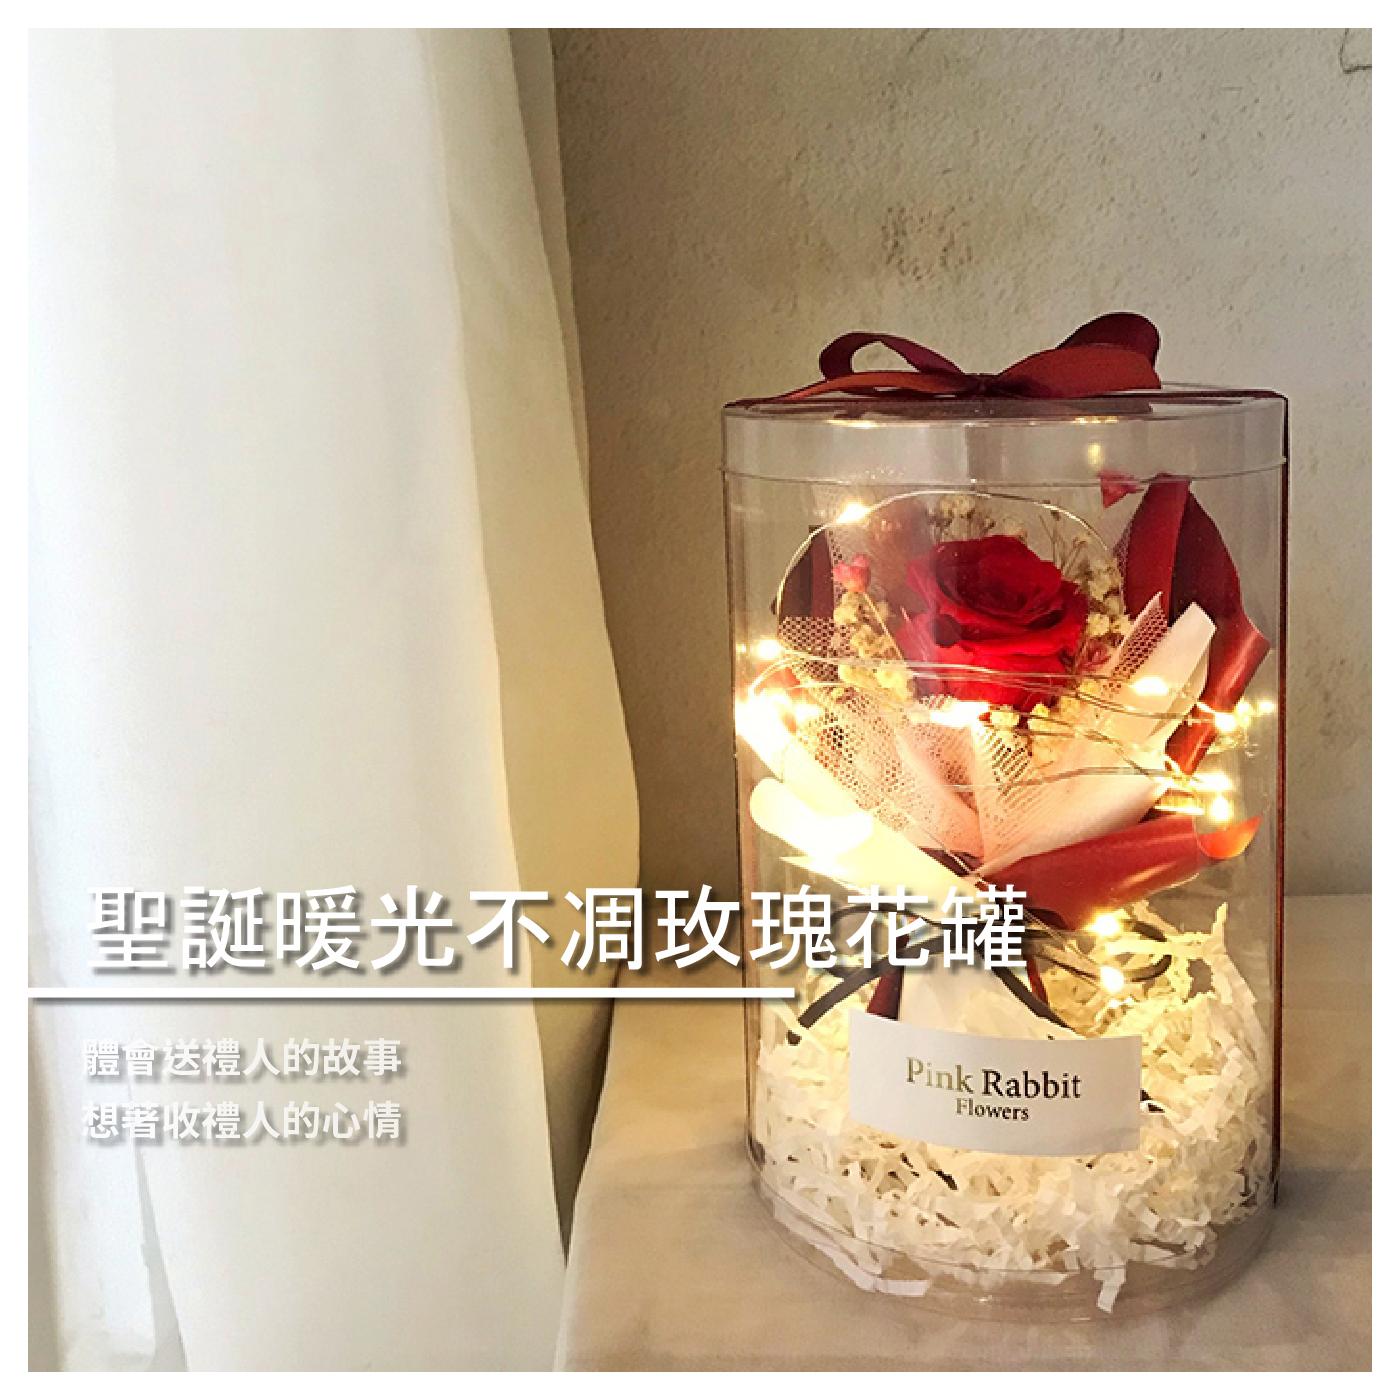 【Pink Rabbit Garden】『PRG永生花乾燥花』聖誕暖光不凋玫瑰花罐 / 花草 / 園藝